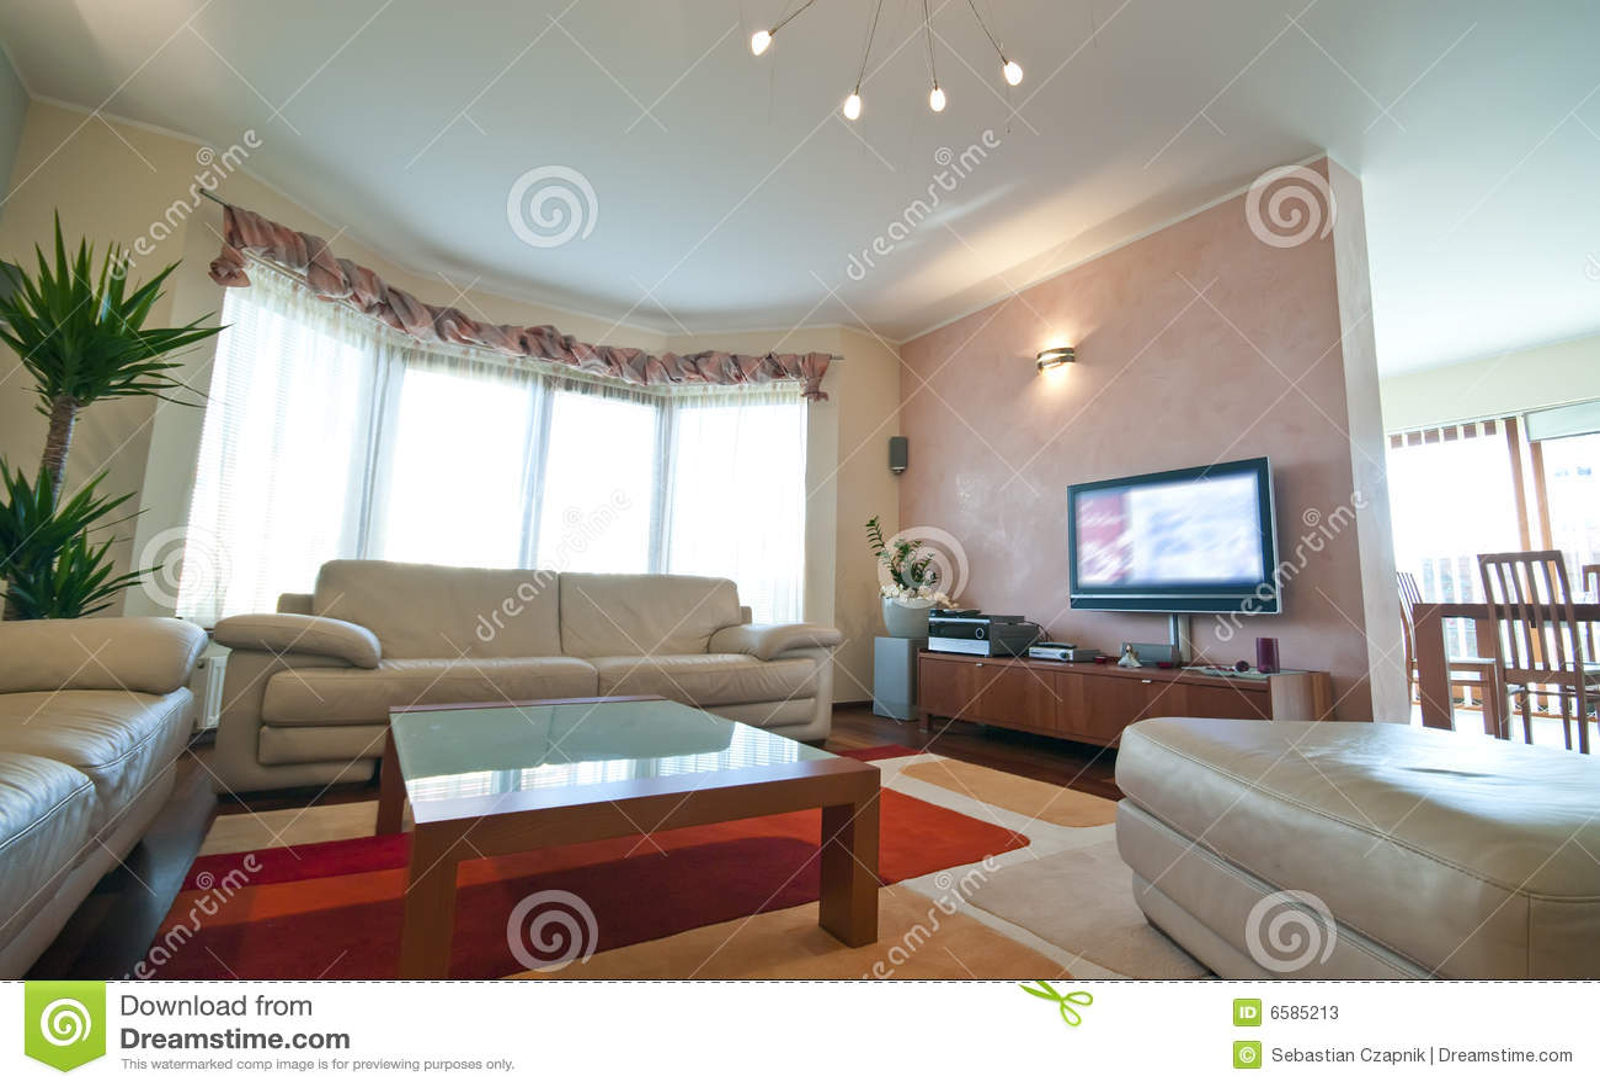 Sala de estar lujosa fotos de archivo imagen 6585213 for Casas modernas interiores salas